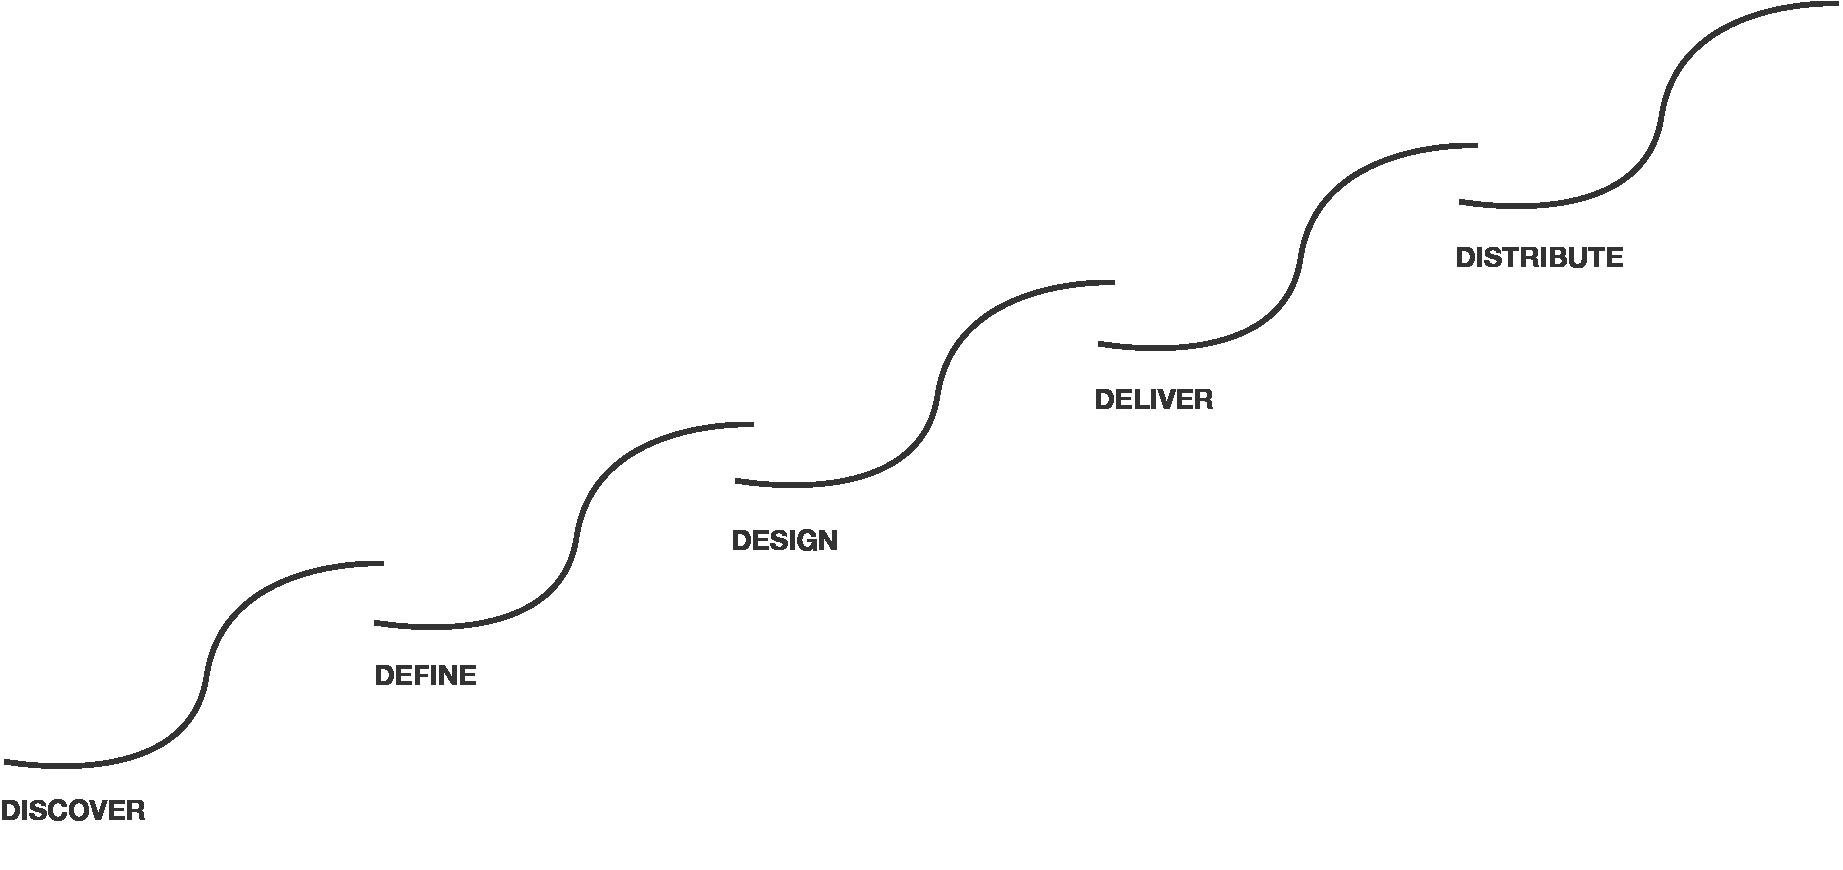 Hagen-Bearbeitungsstufen